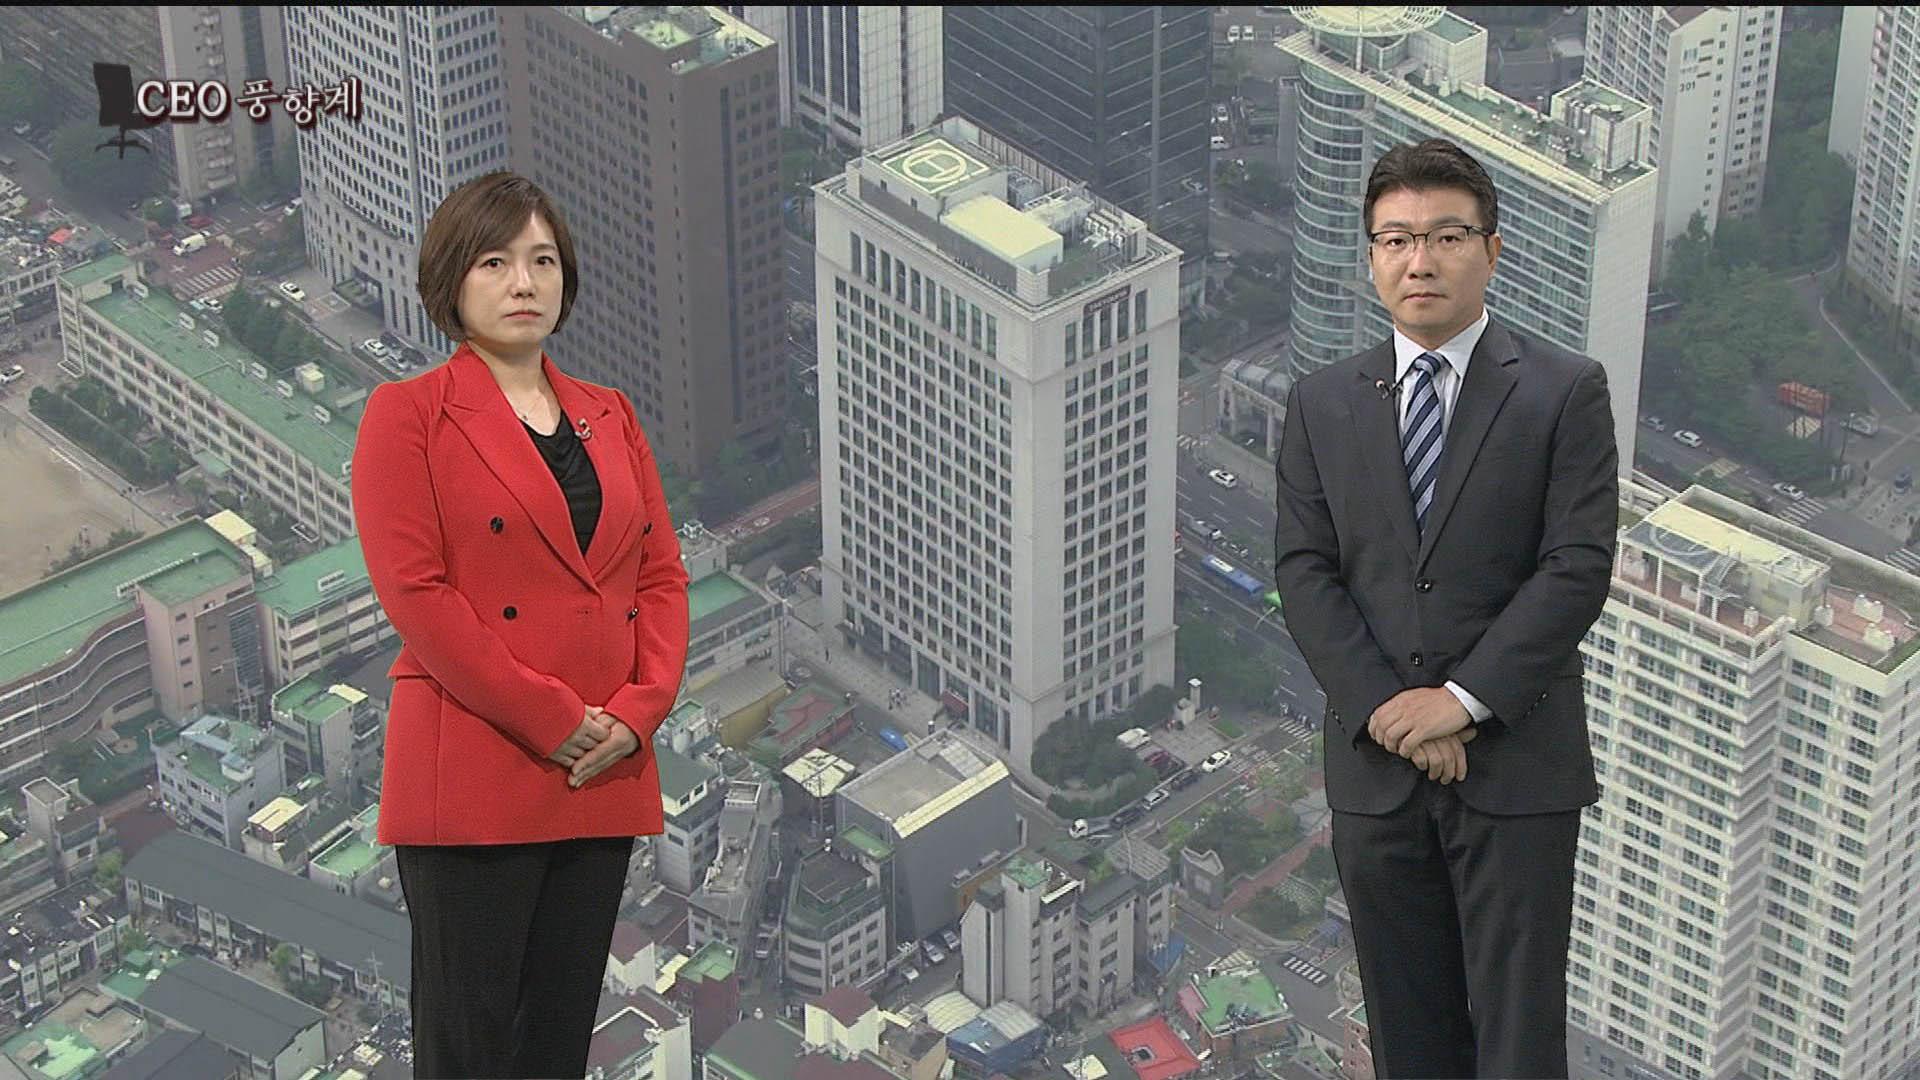 [CEO풍향계] 3세 경영승계 시동 서경배…웅진코웨이 인수 방준혁